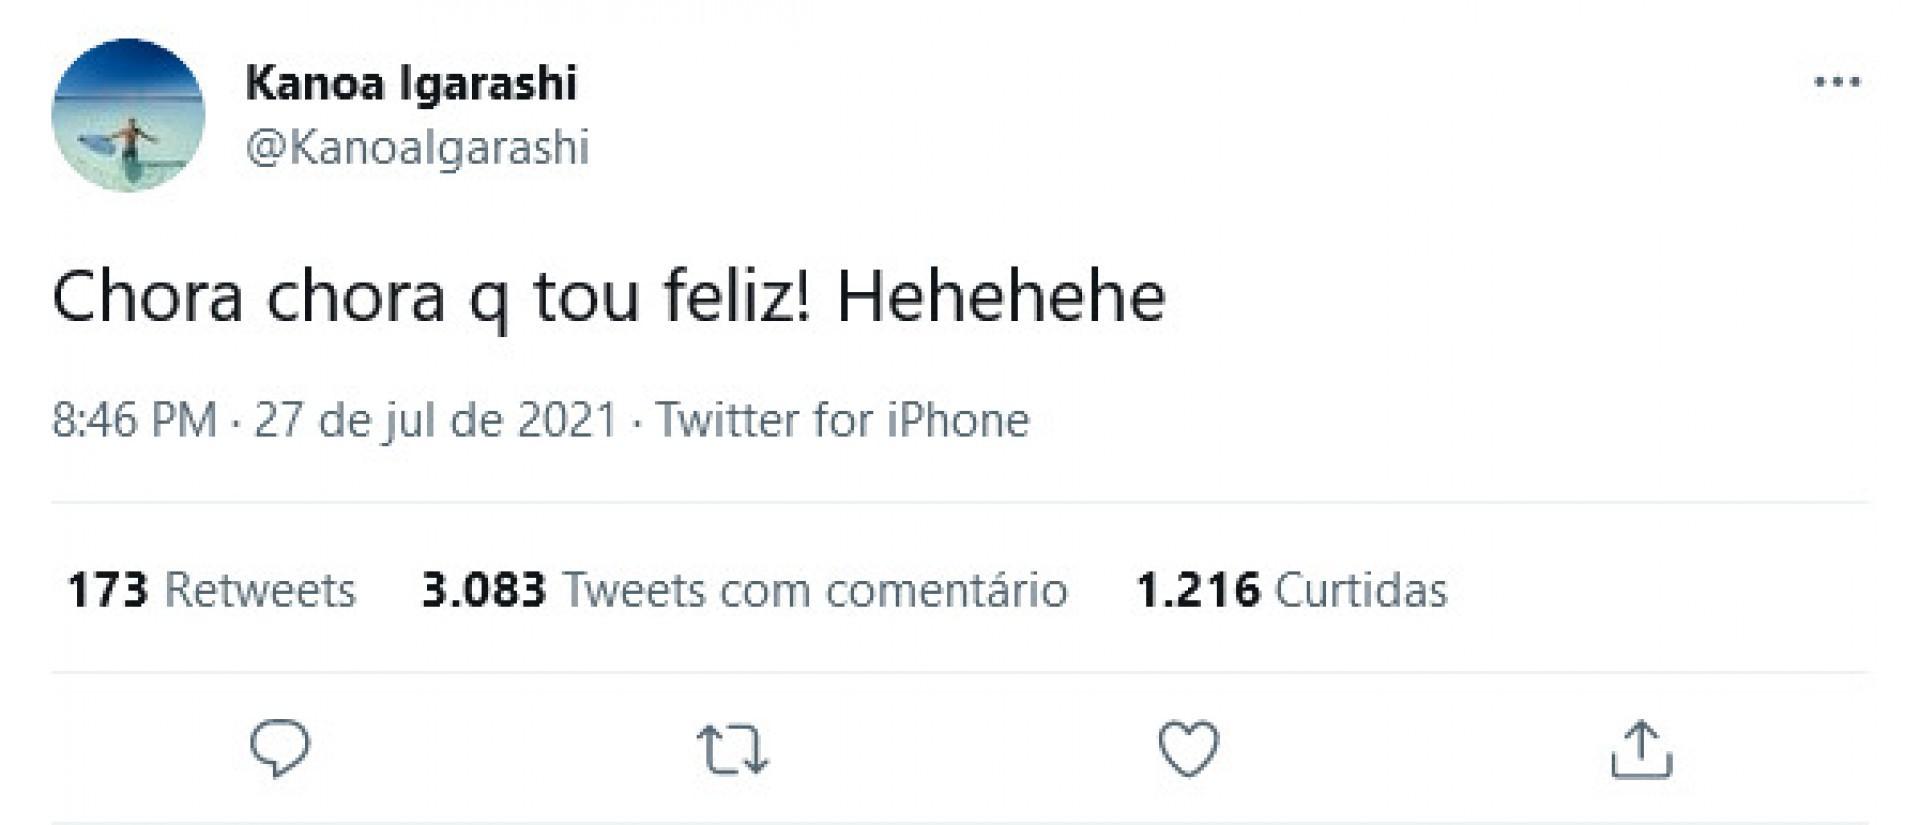 Comentário feito por Kanoa Igarashi ironizando brasileiros